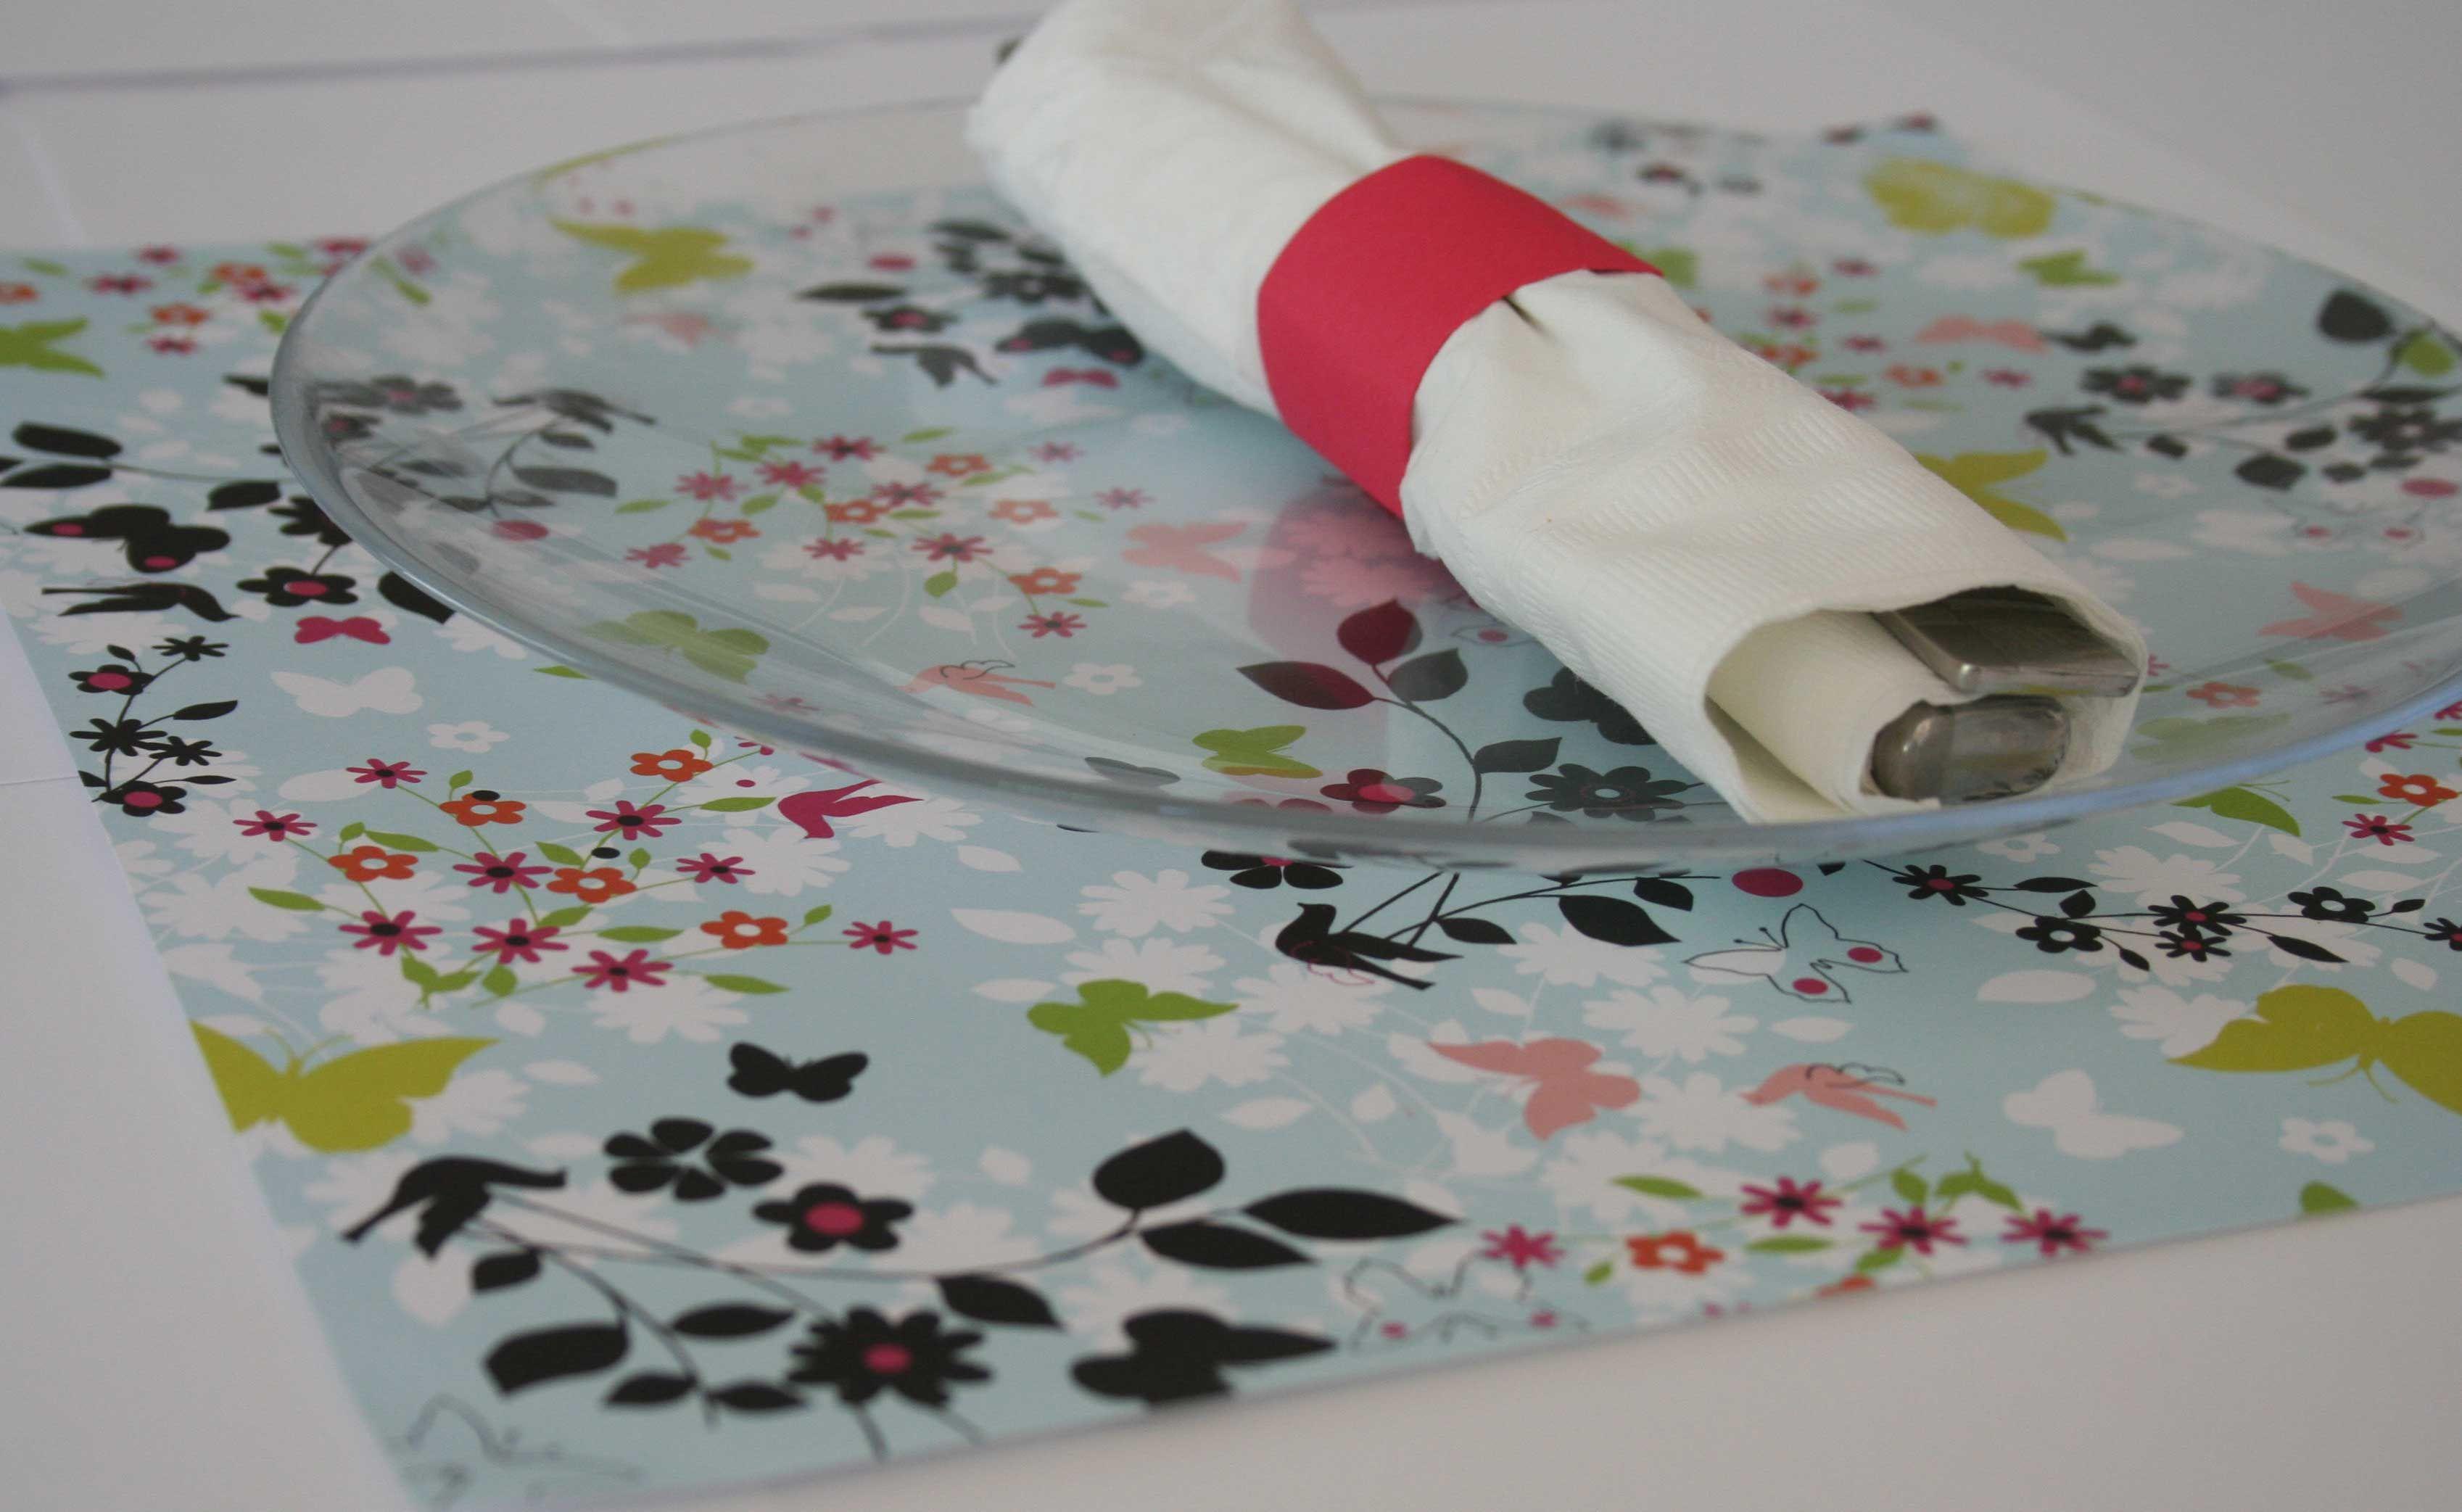 Diy Placemats Using Paper Projectsssss Pinterest Scrapbook